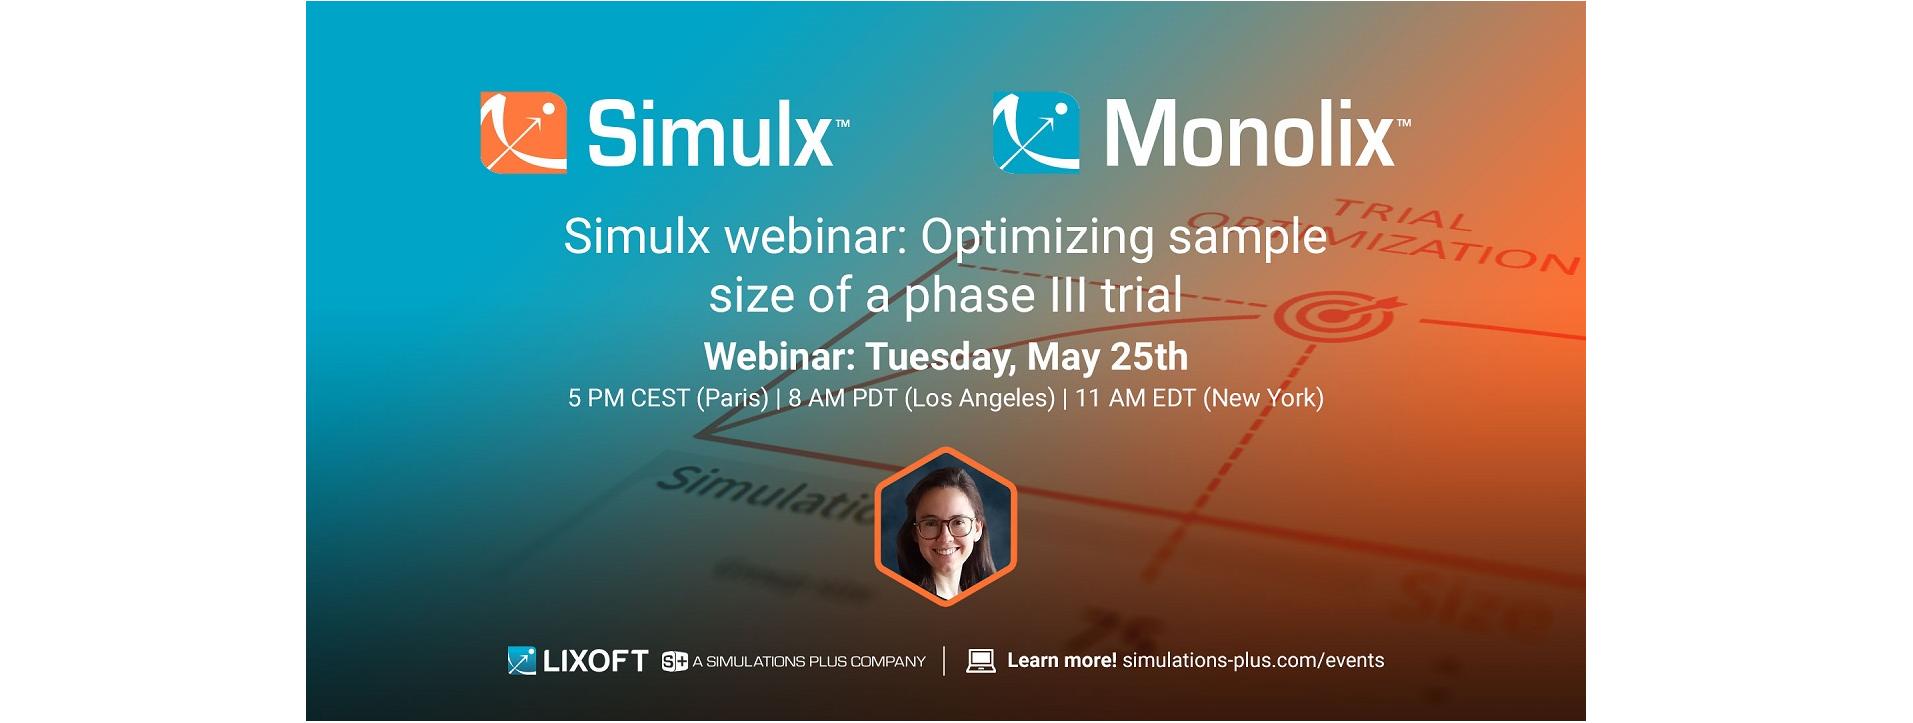 Simulx webinar: Optimizing sample size of a phase III trial